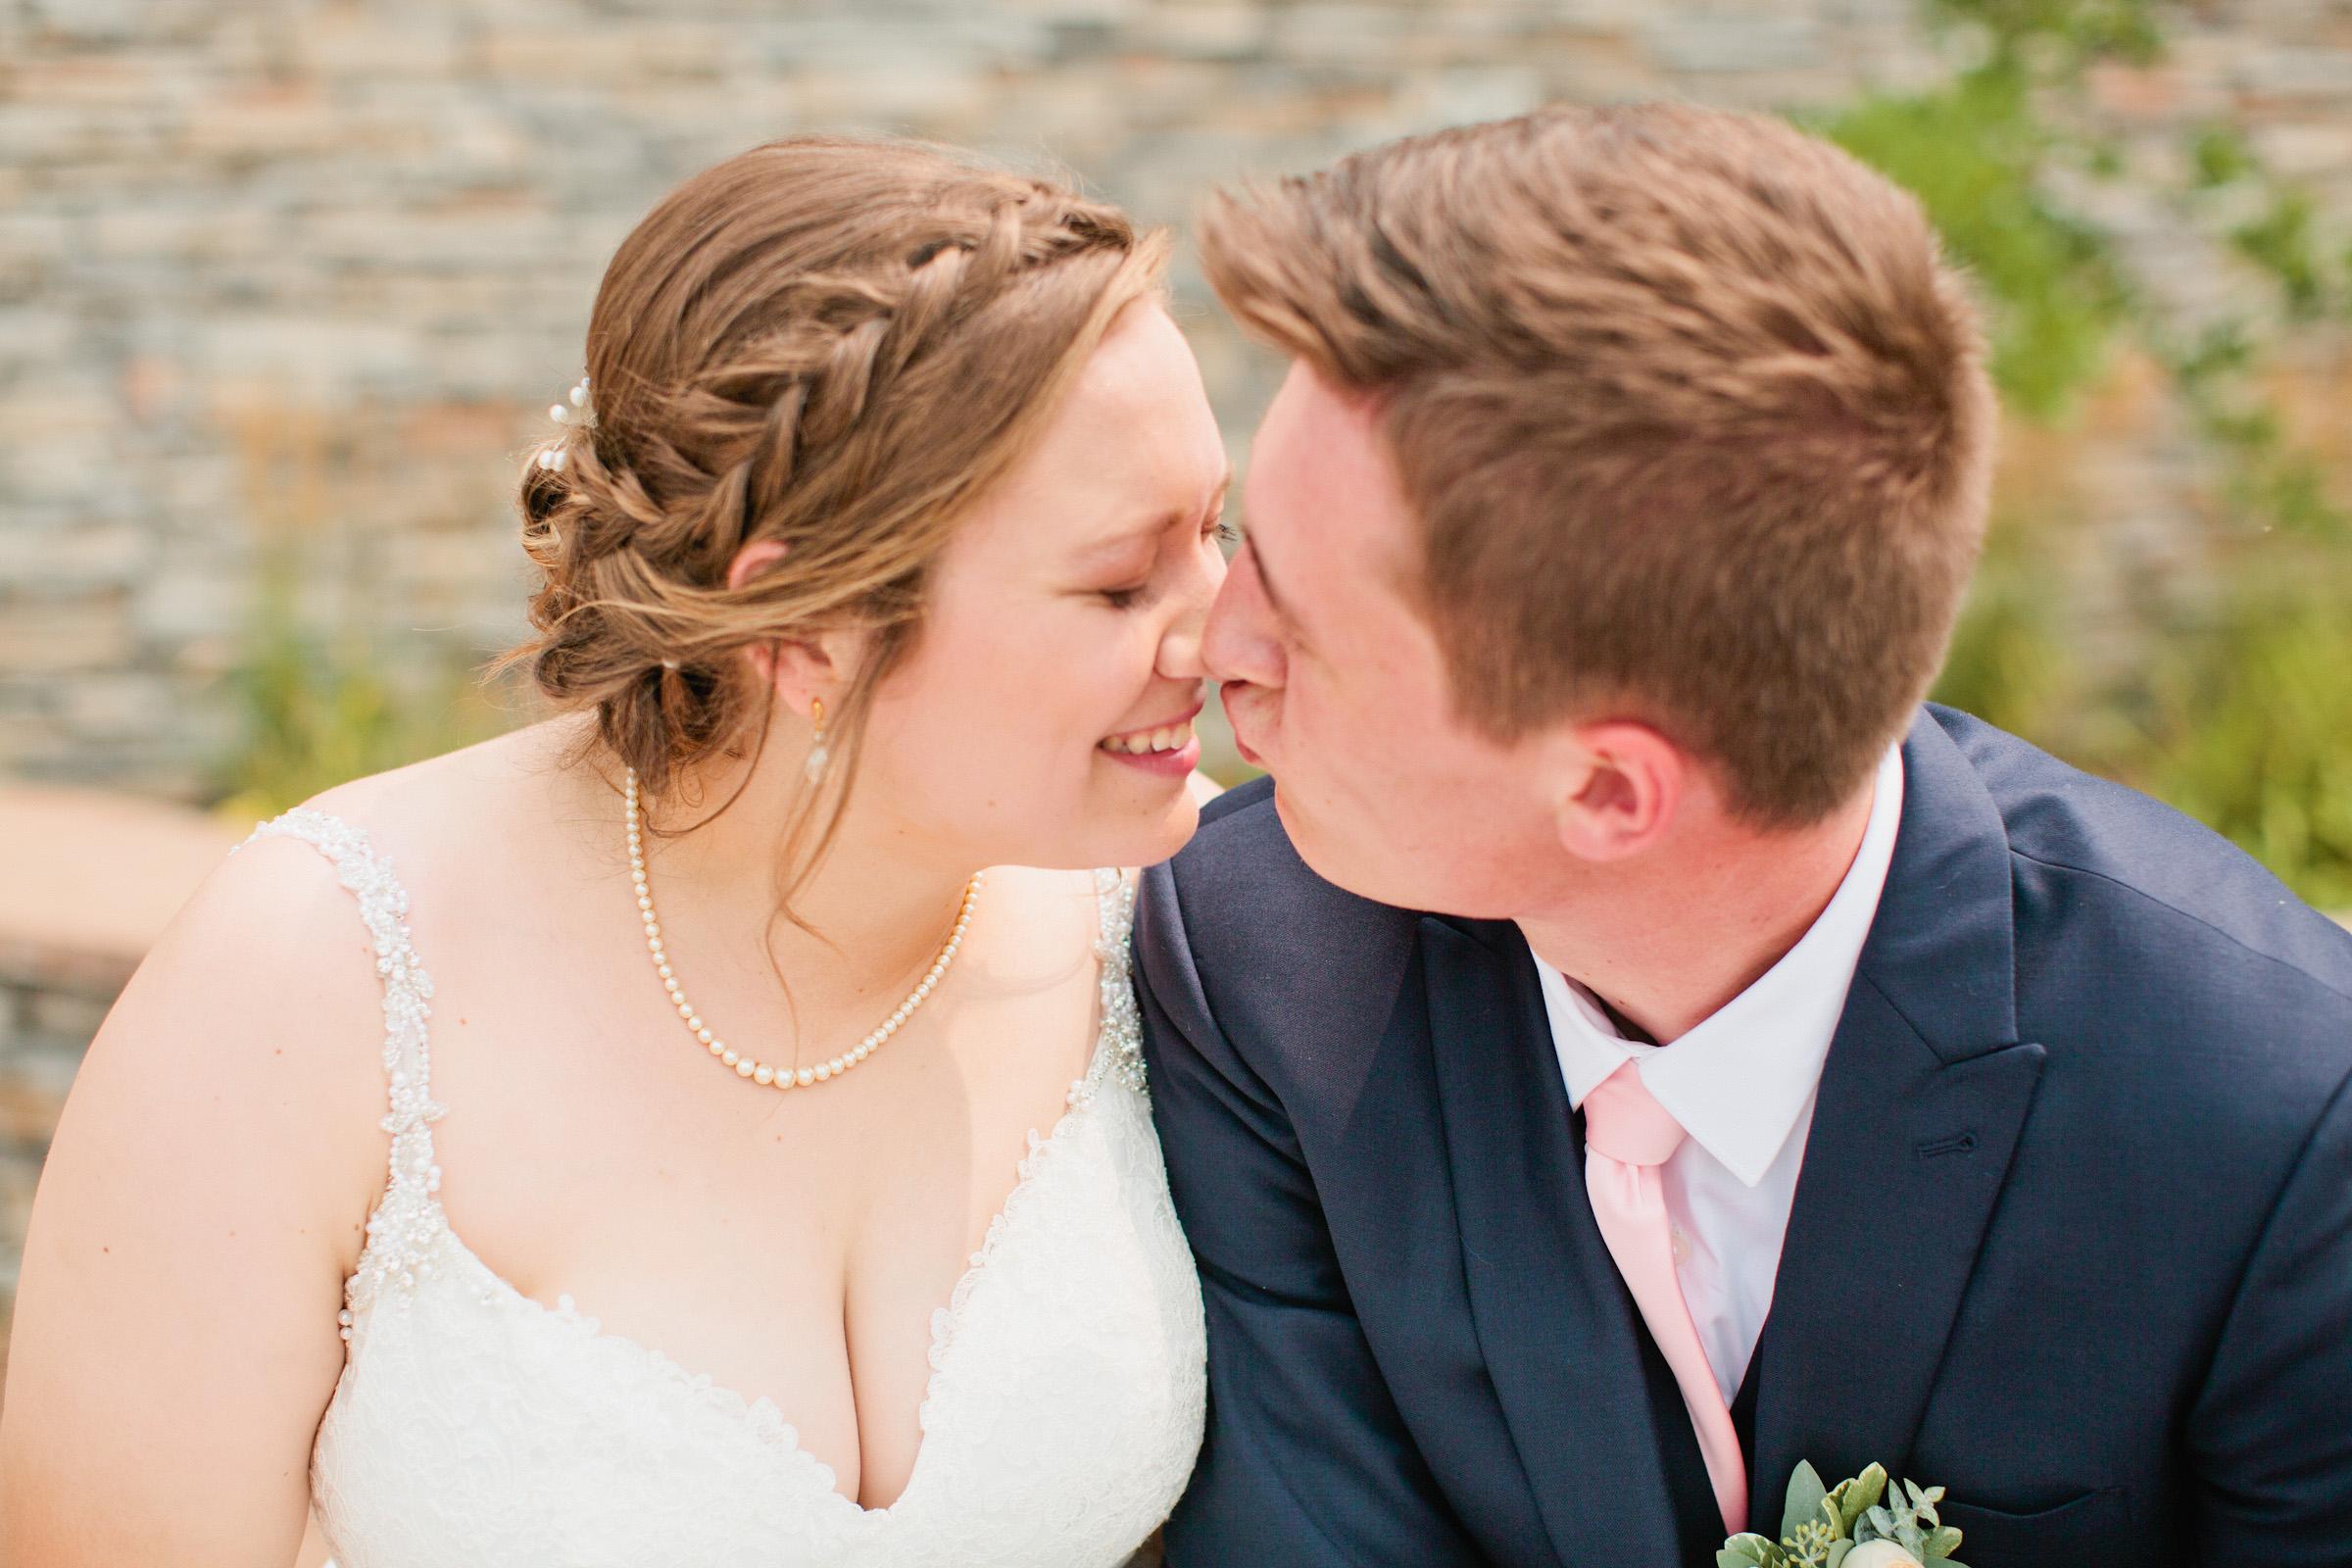 groom kissing bride on tip of nose